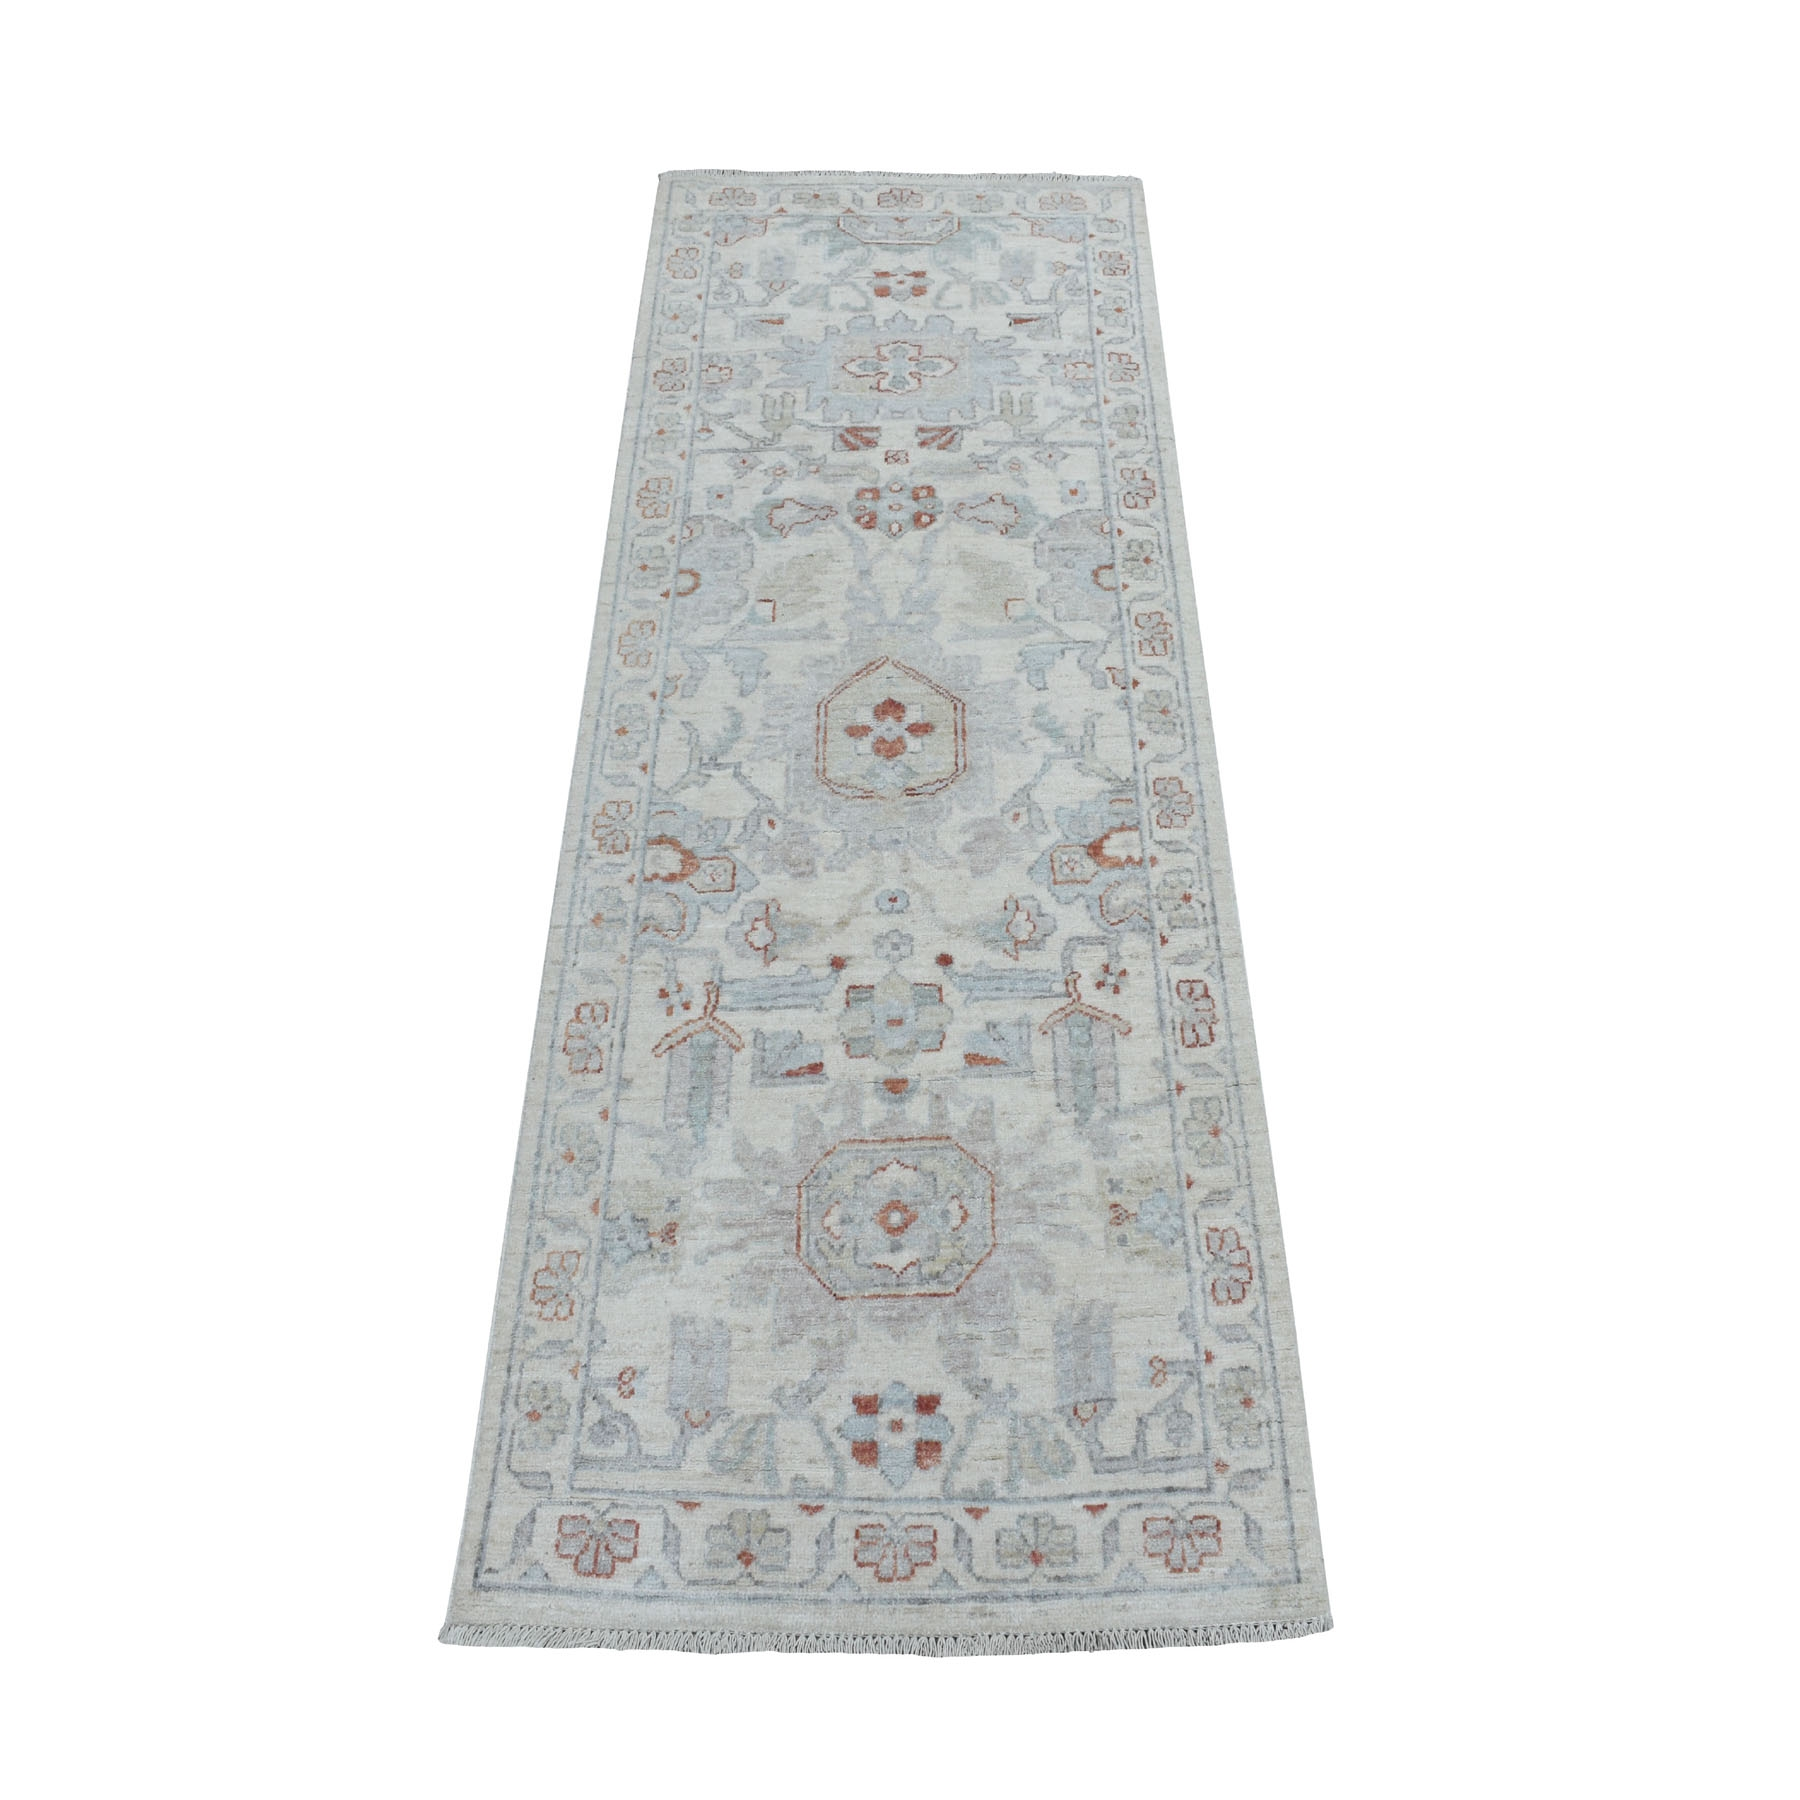 "2'7""X6'1"" White Wash Peshawar 100% Wool Hand Knotted Oriental Rug moaebecd"